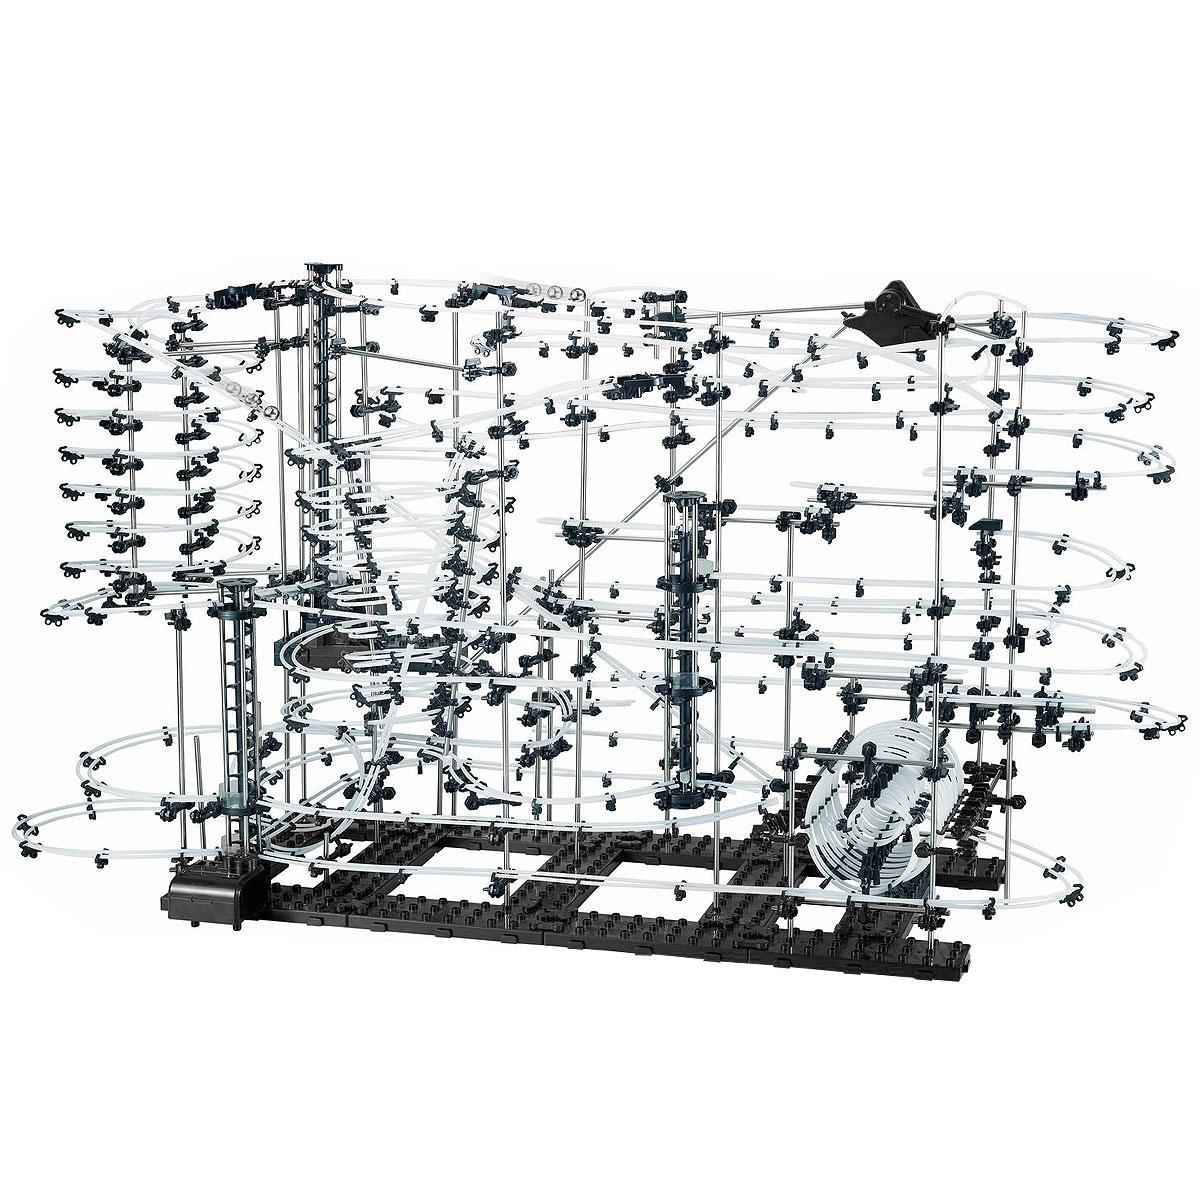 Space Rail Конструктор Уровень 9 231-9 ( 231-9 )